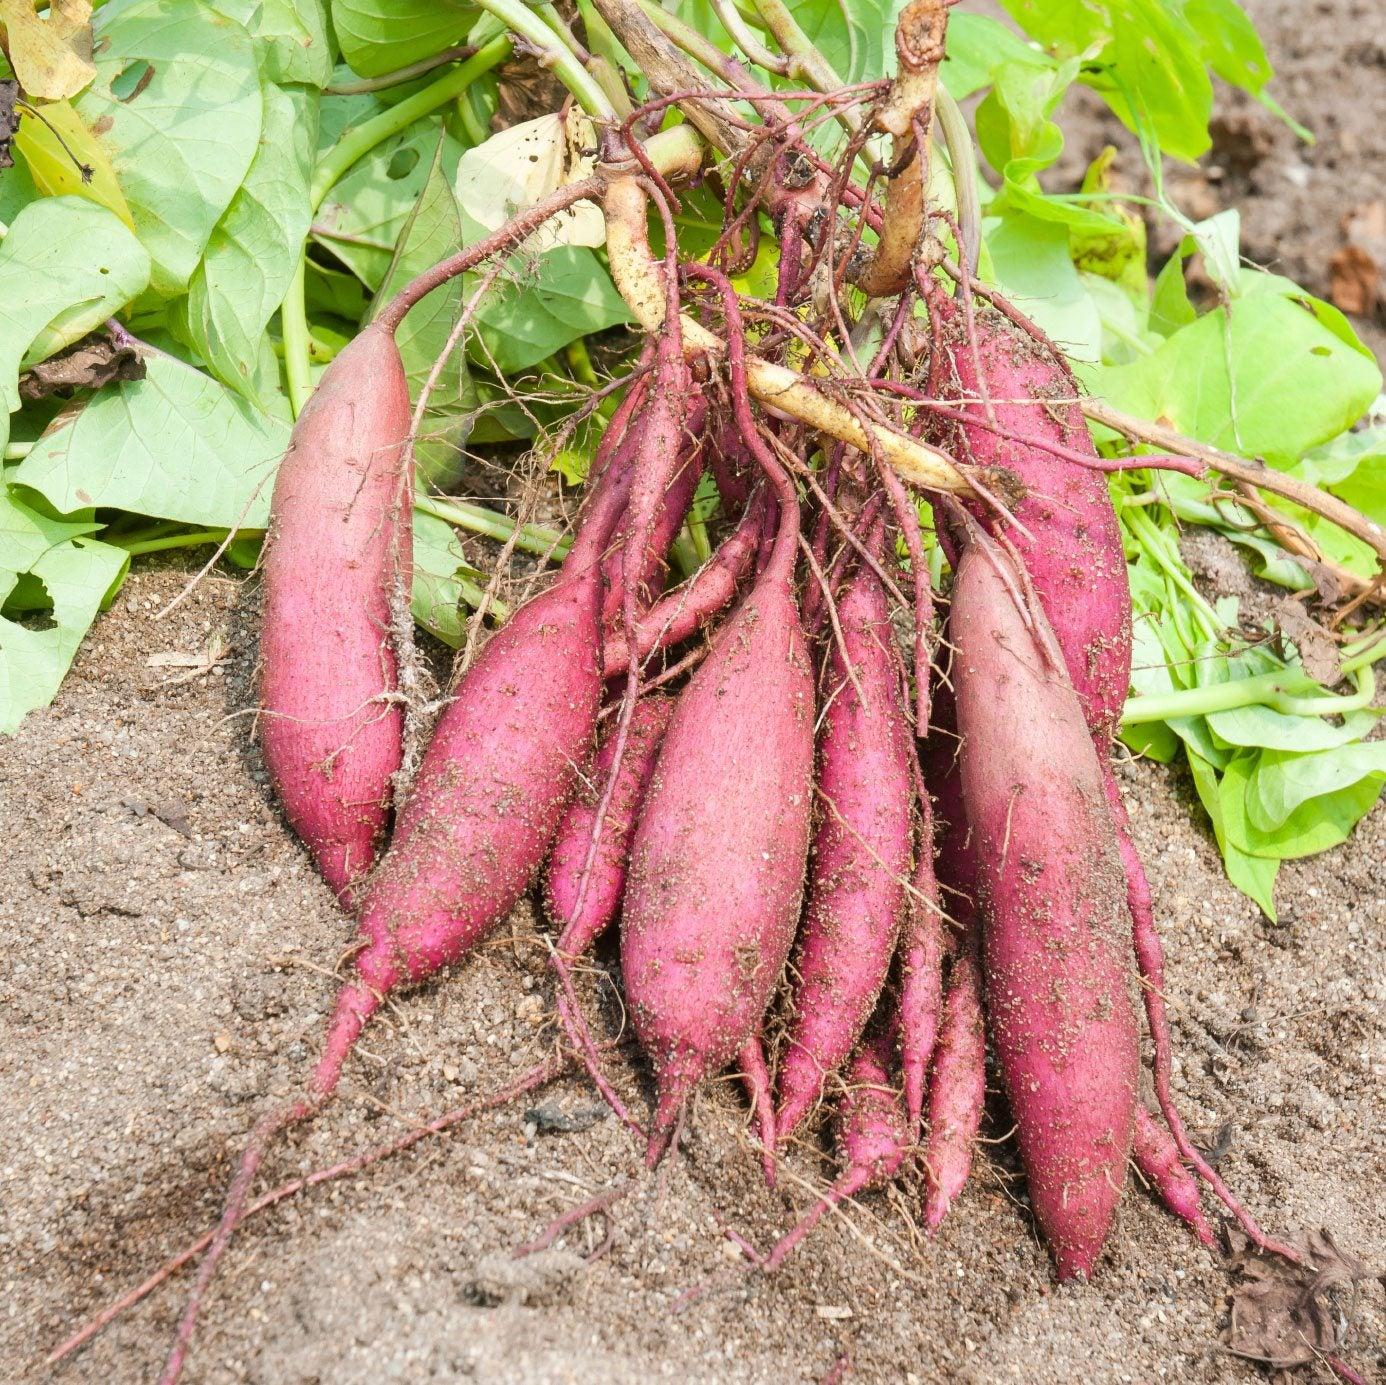 Sweet Potatoes: Planting, Growing, and Harvesting Sweet ...